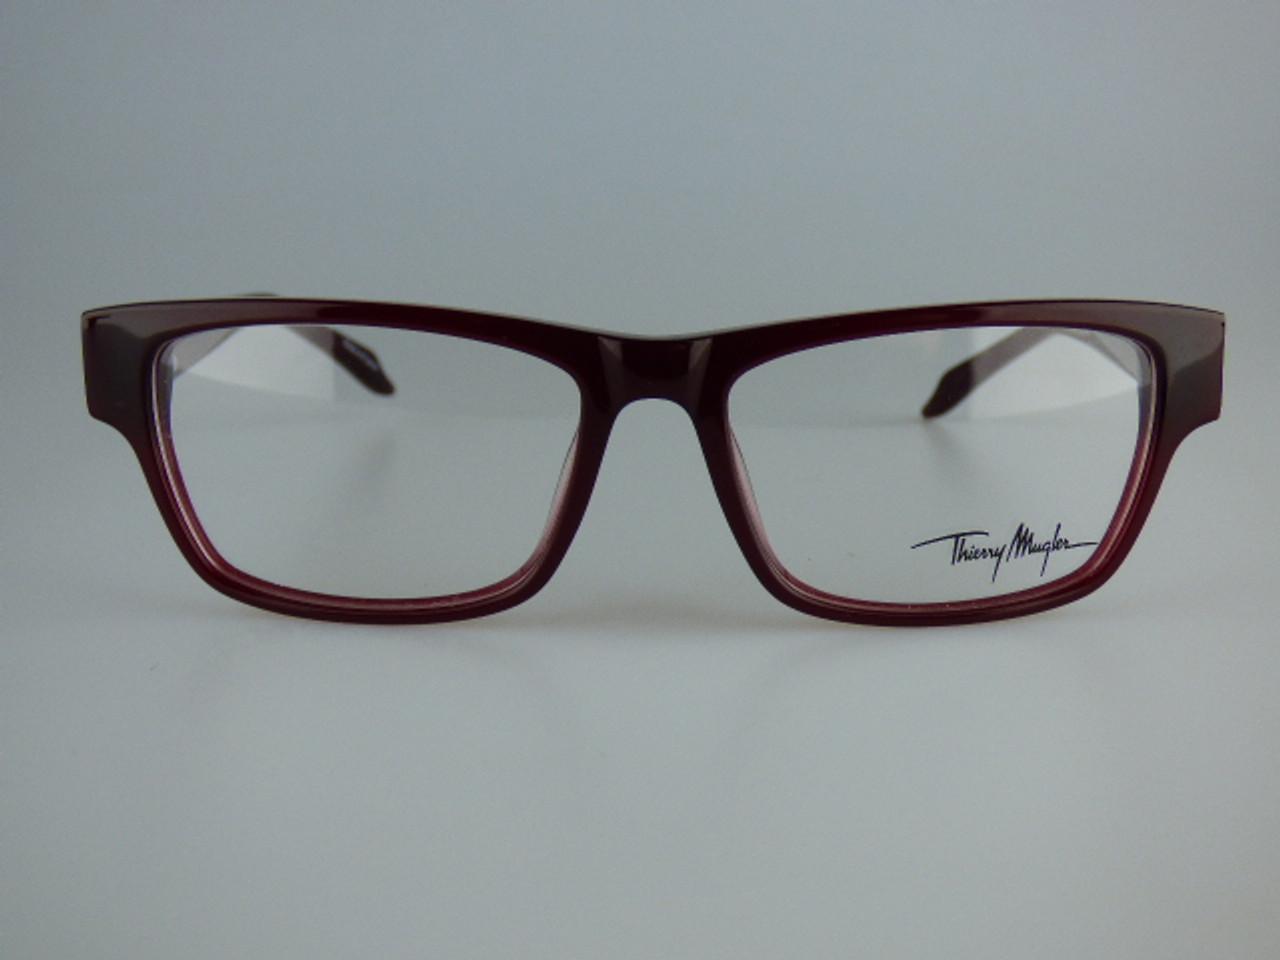 5cf06a791fd1 Thierry Mugler Eyeglasses model TM 9341 - Eyeglassframes4less.com